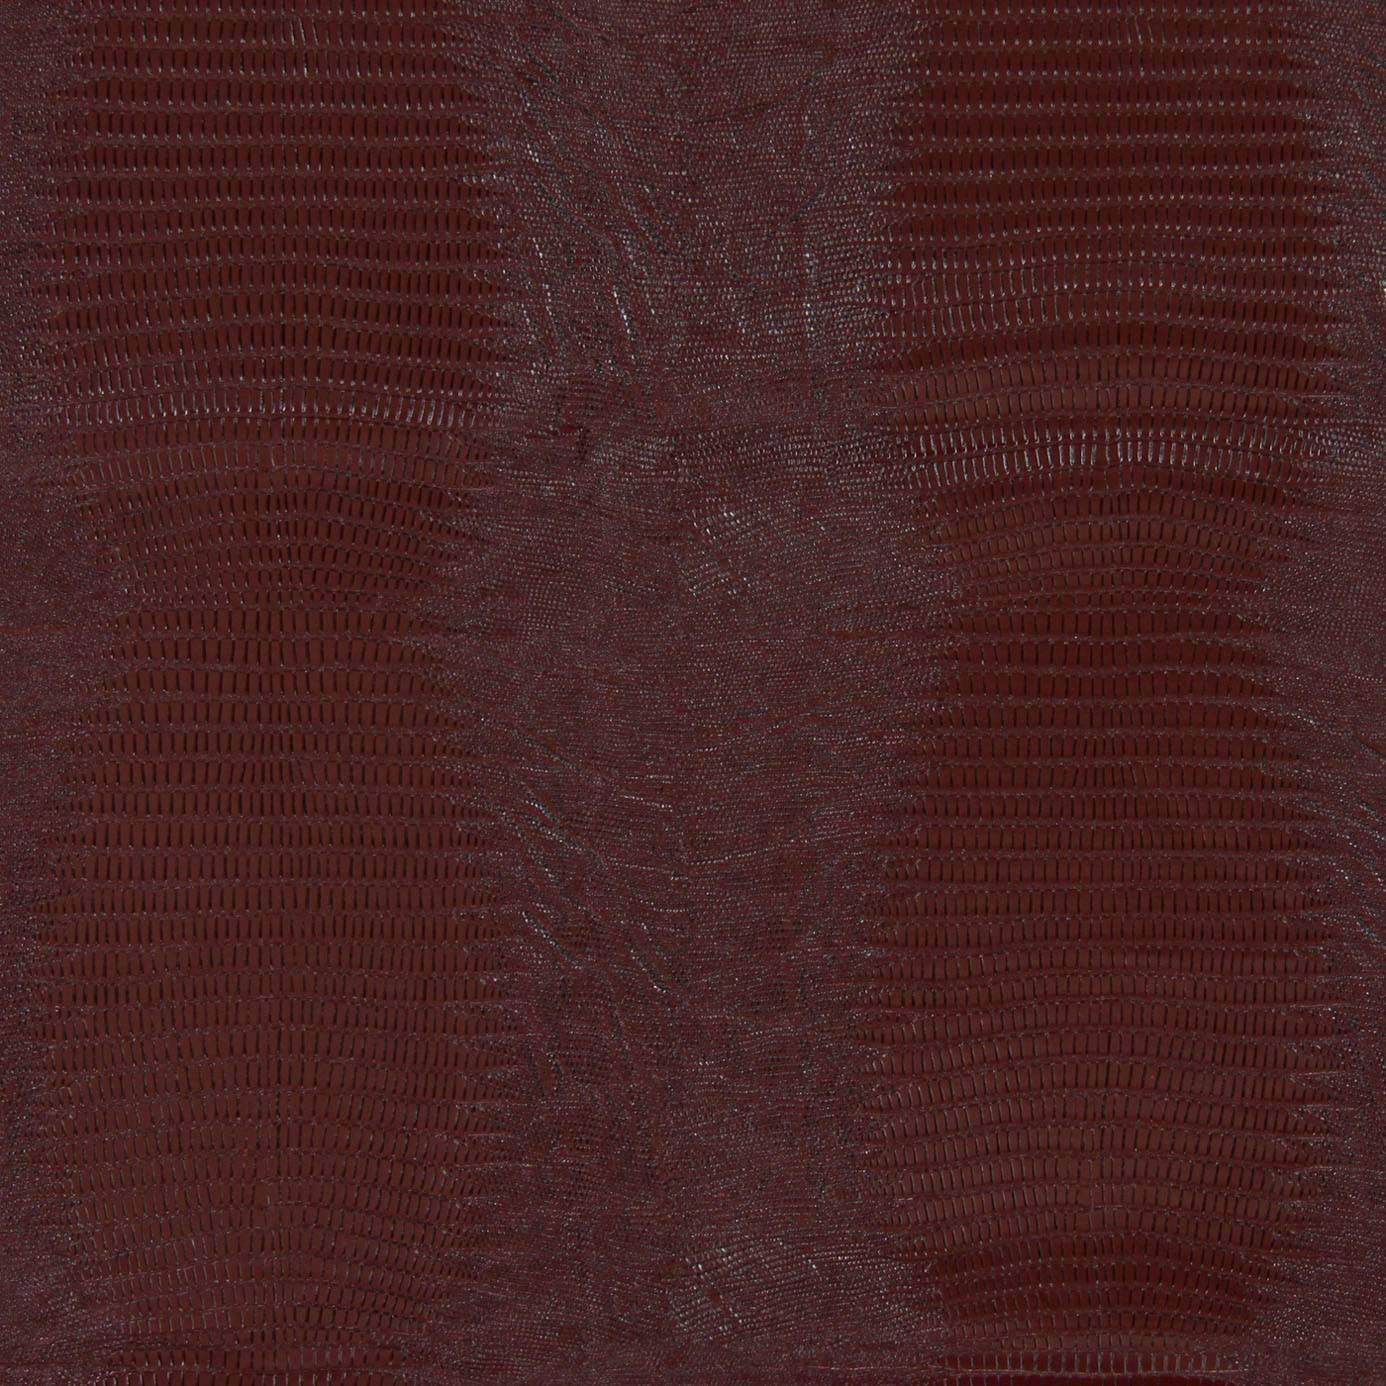 Crocodile Fabric Port 1220 317 Prestigious Textiles